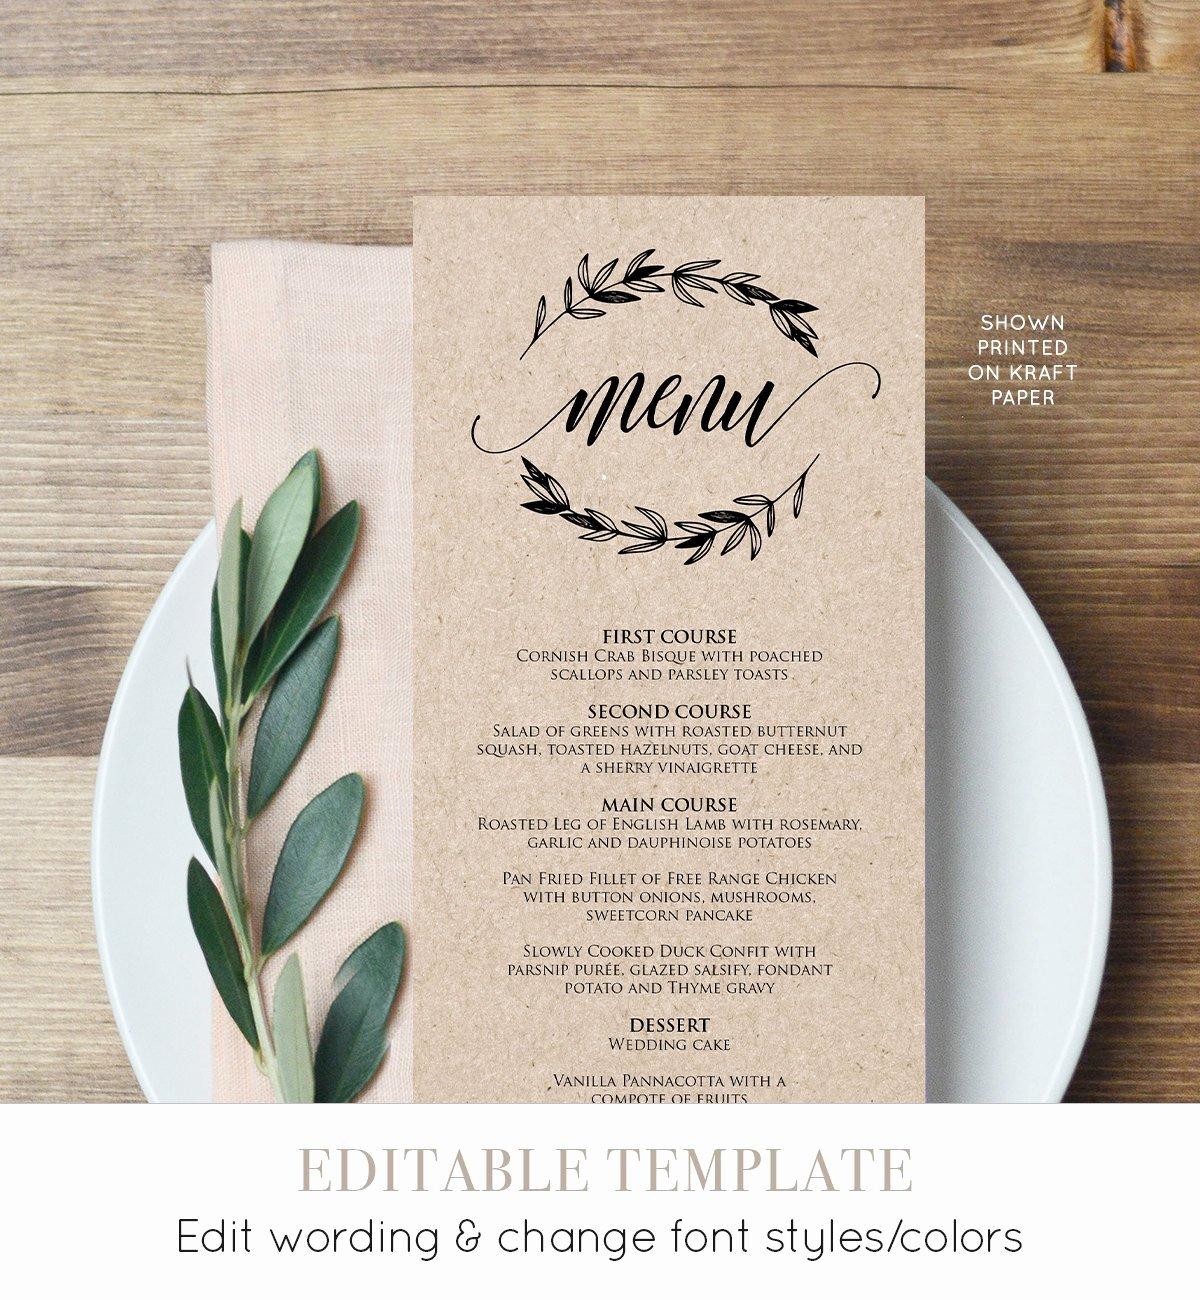 Wedding Menu Card Template Beautiful Rustic Wedding Menu Template Printable Menu Card